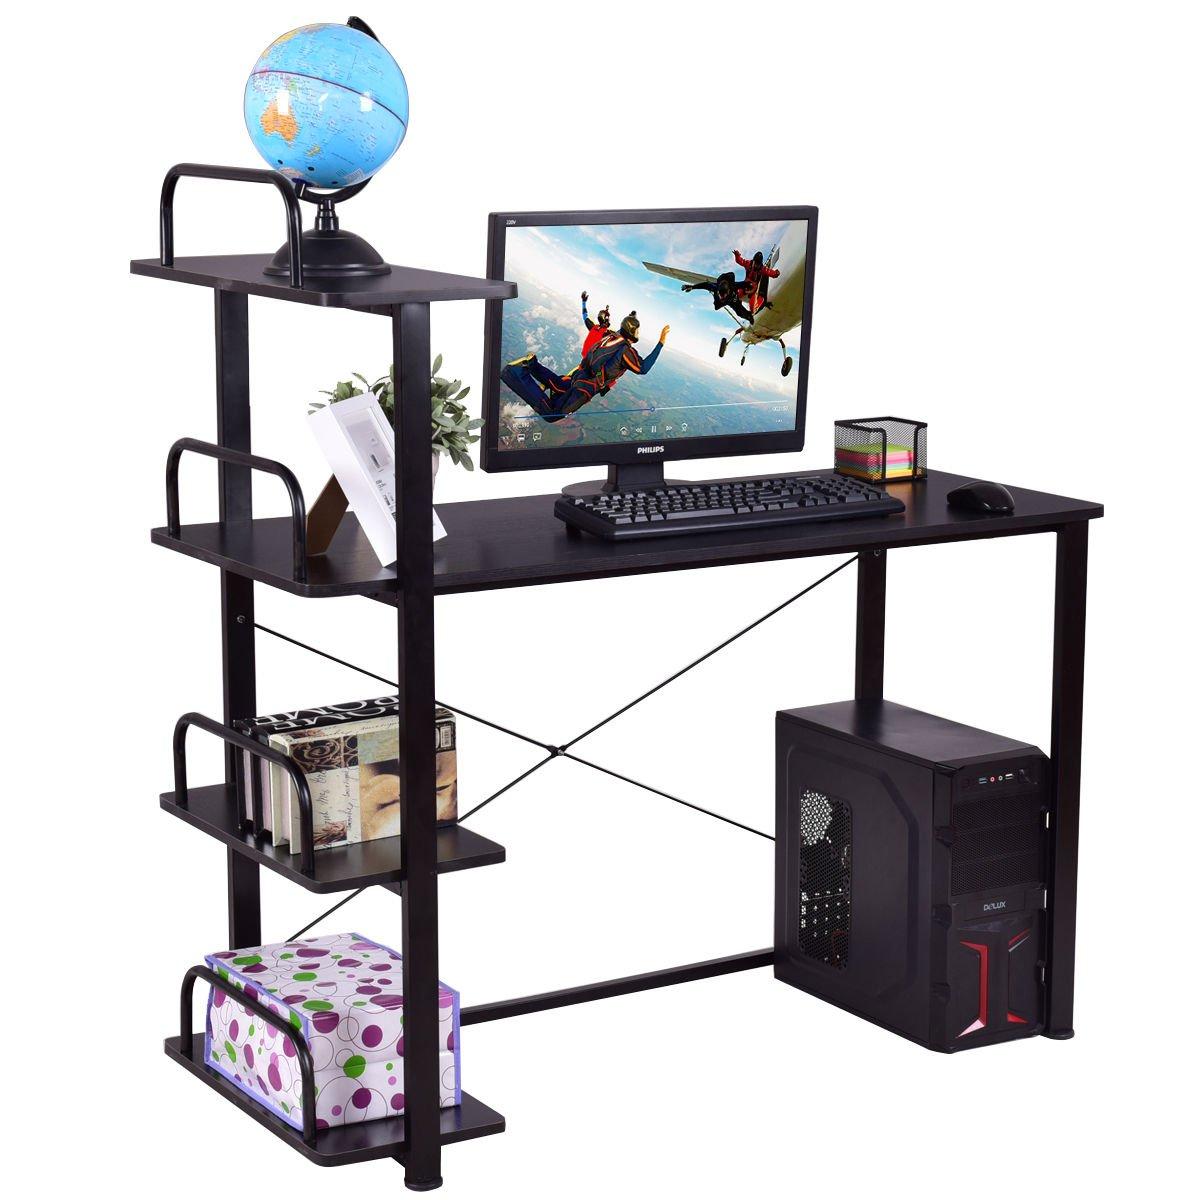 laptop printer buy rack product home rolling yescomusa tower computer shelf shop rakuten drawer desk study table mobile office cd